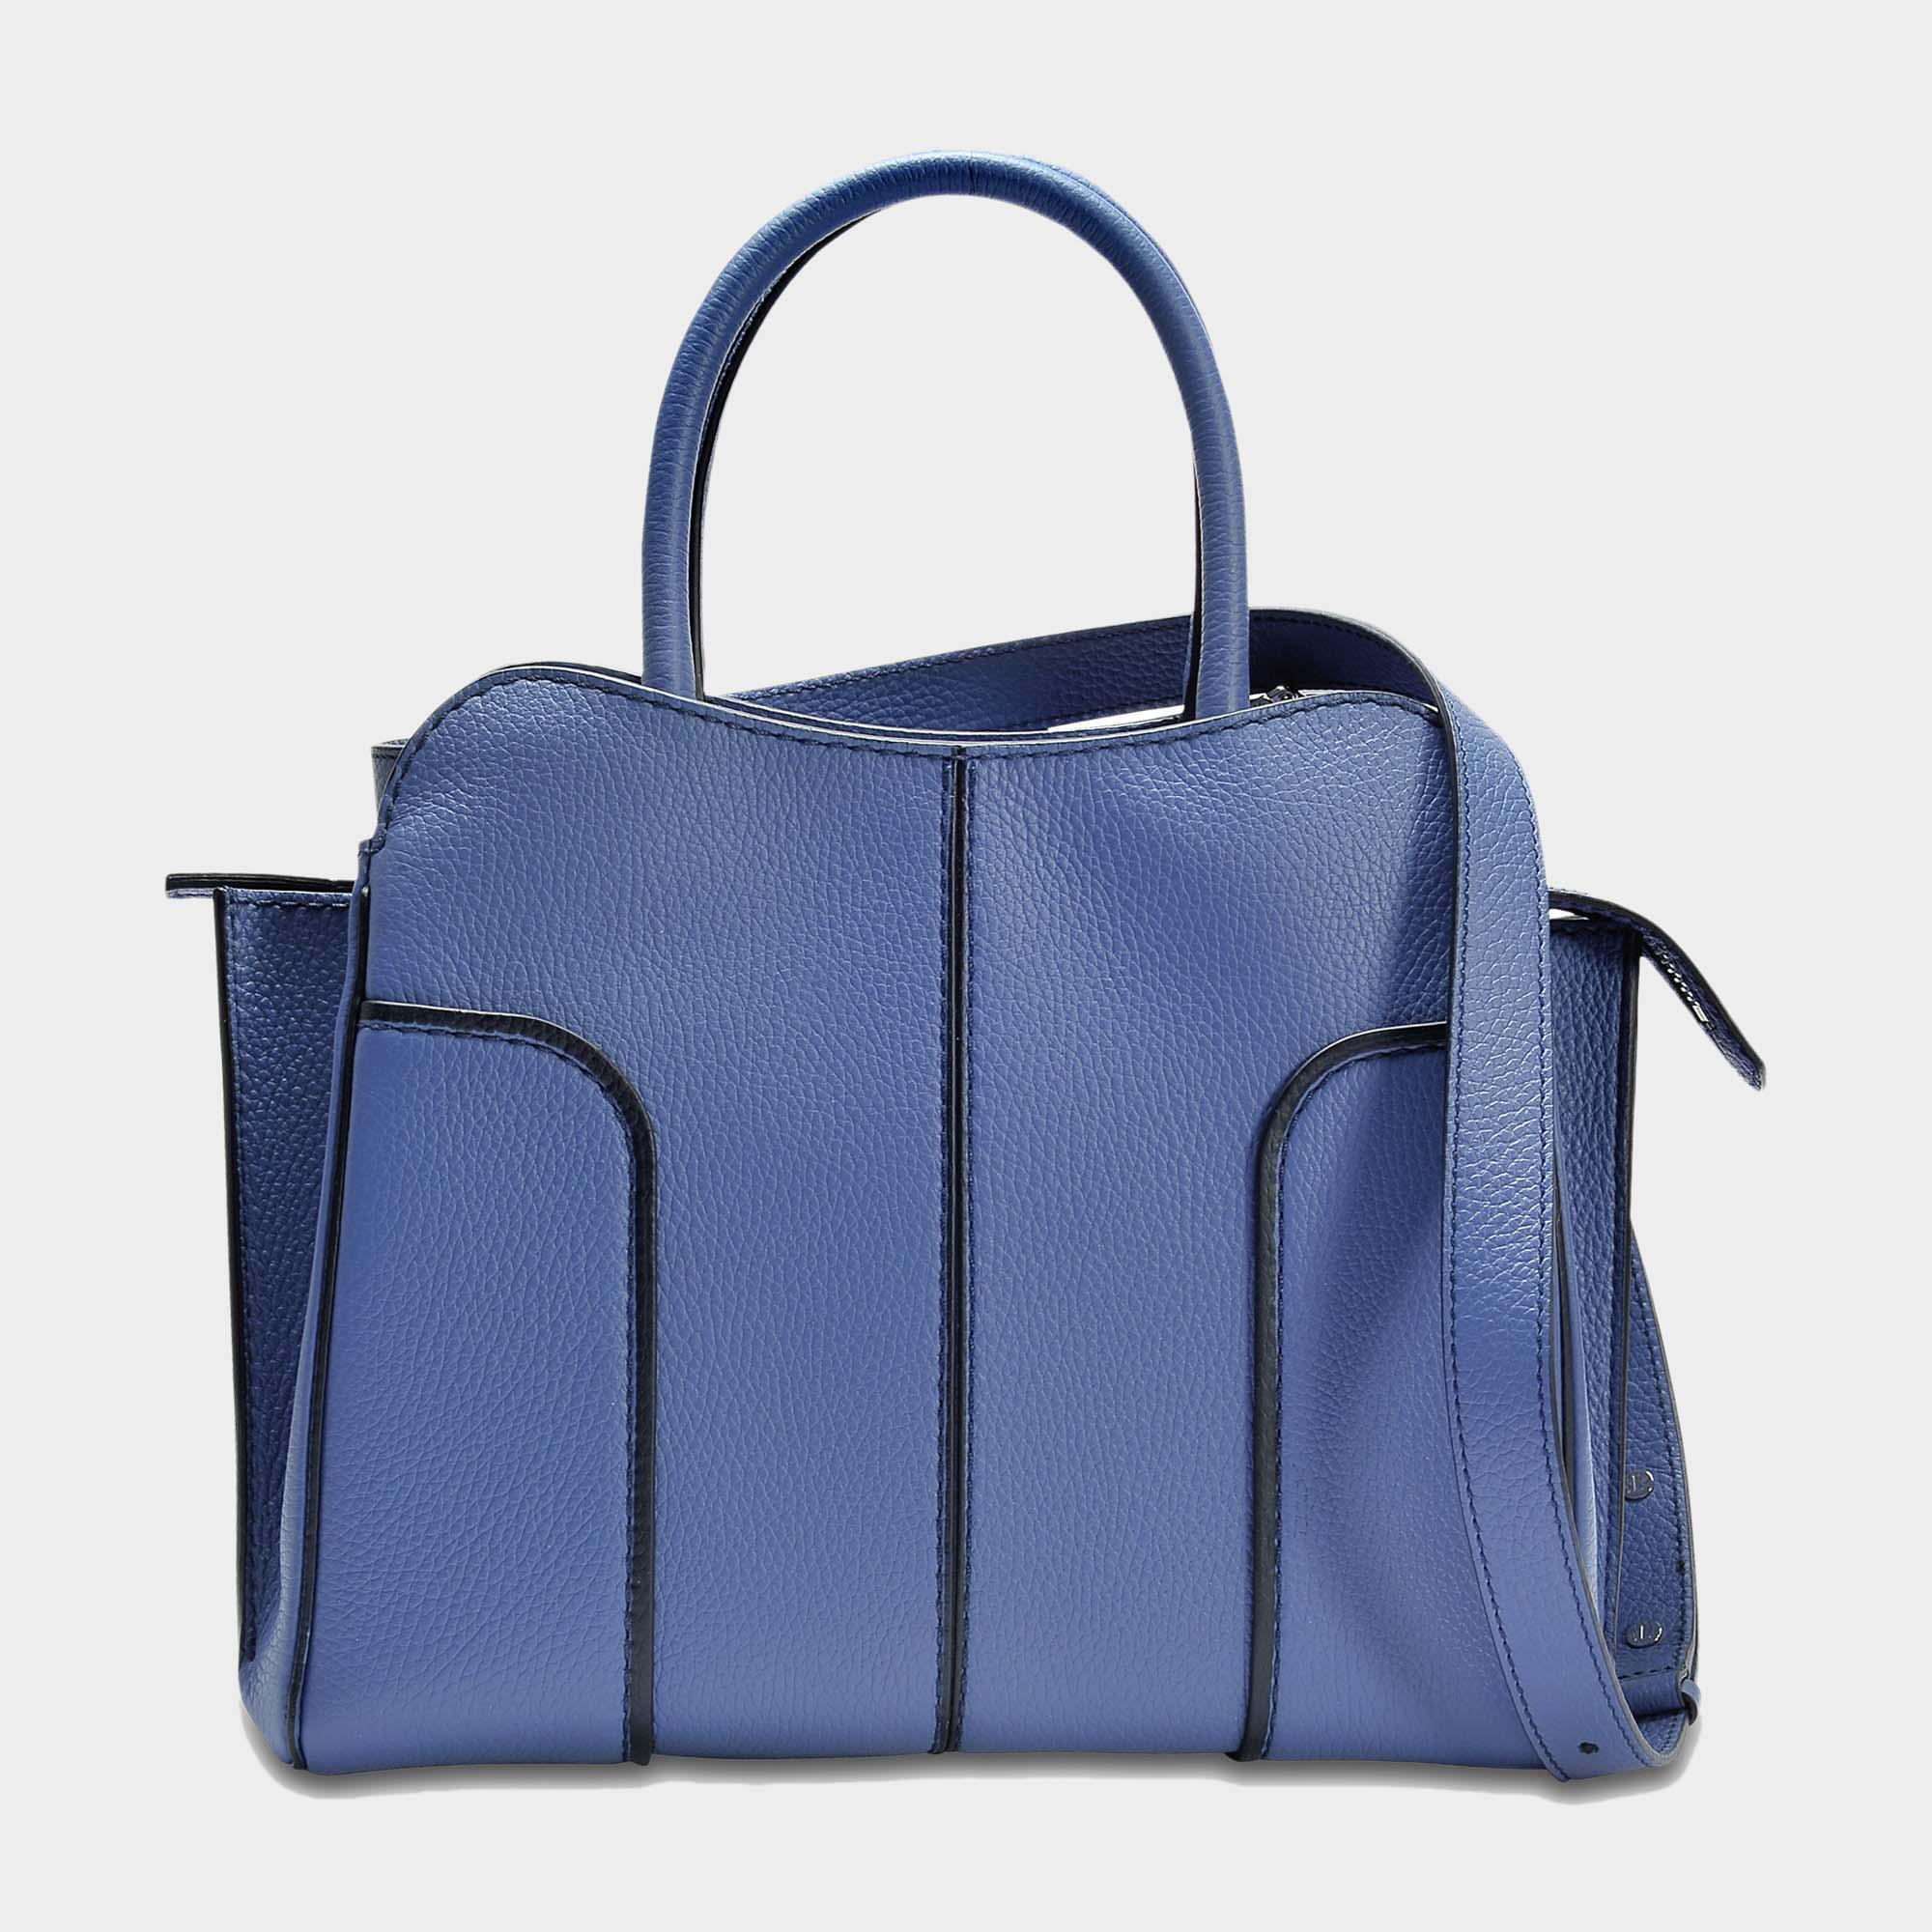 acheter populaire 8e43f 0491a Lyst - Tod's Petit Sac Sella in Blue